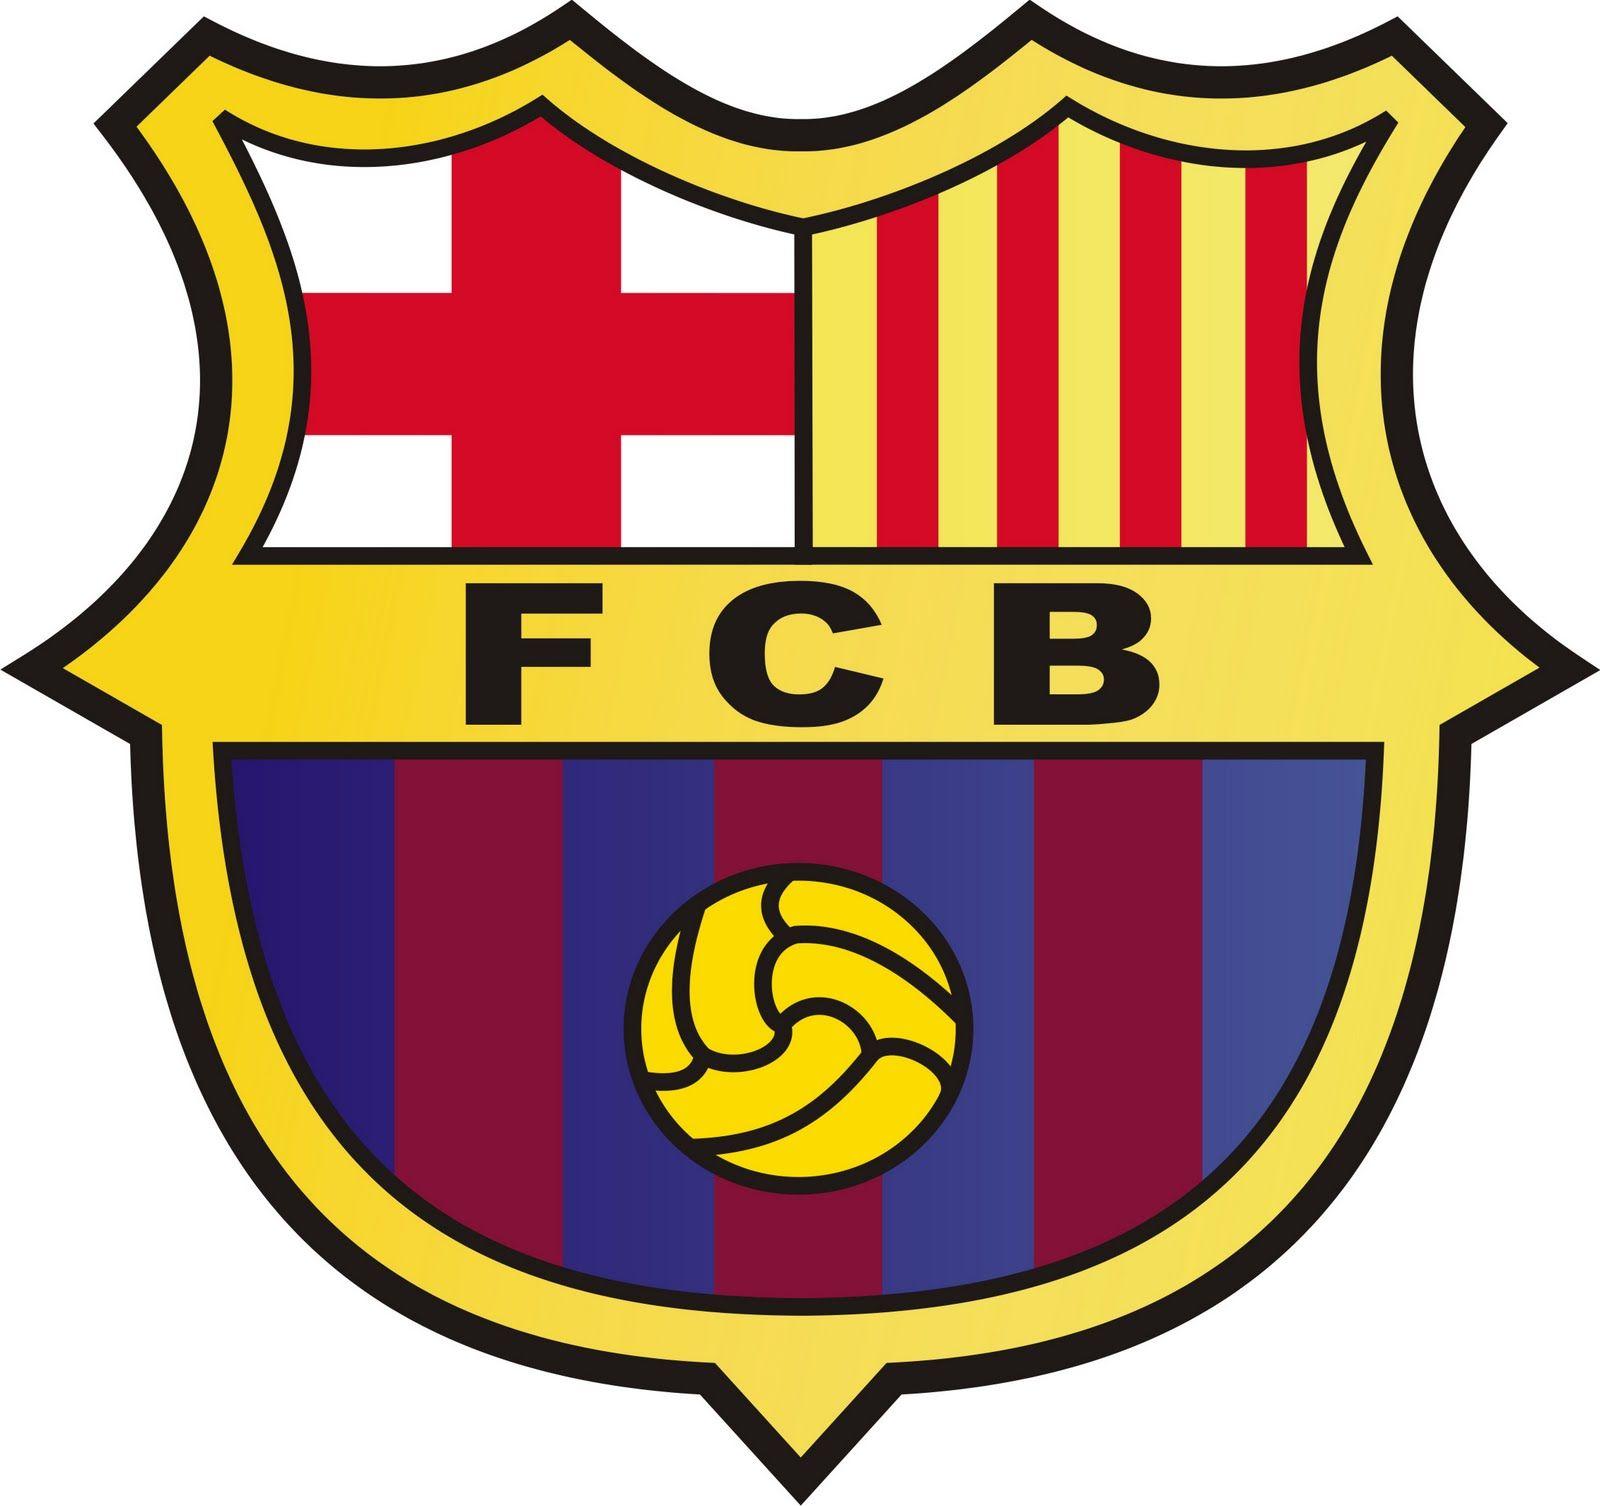 Barcelona Logo Free Large Images Barcelona Team Barcelona Football Barcelona Futbol Club